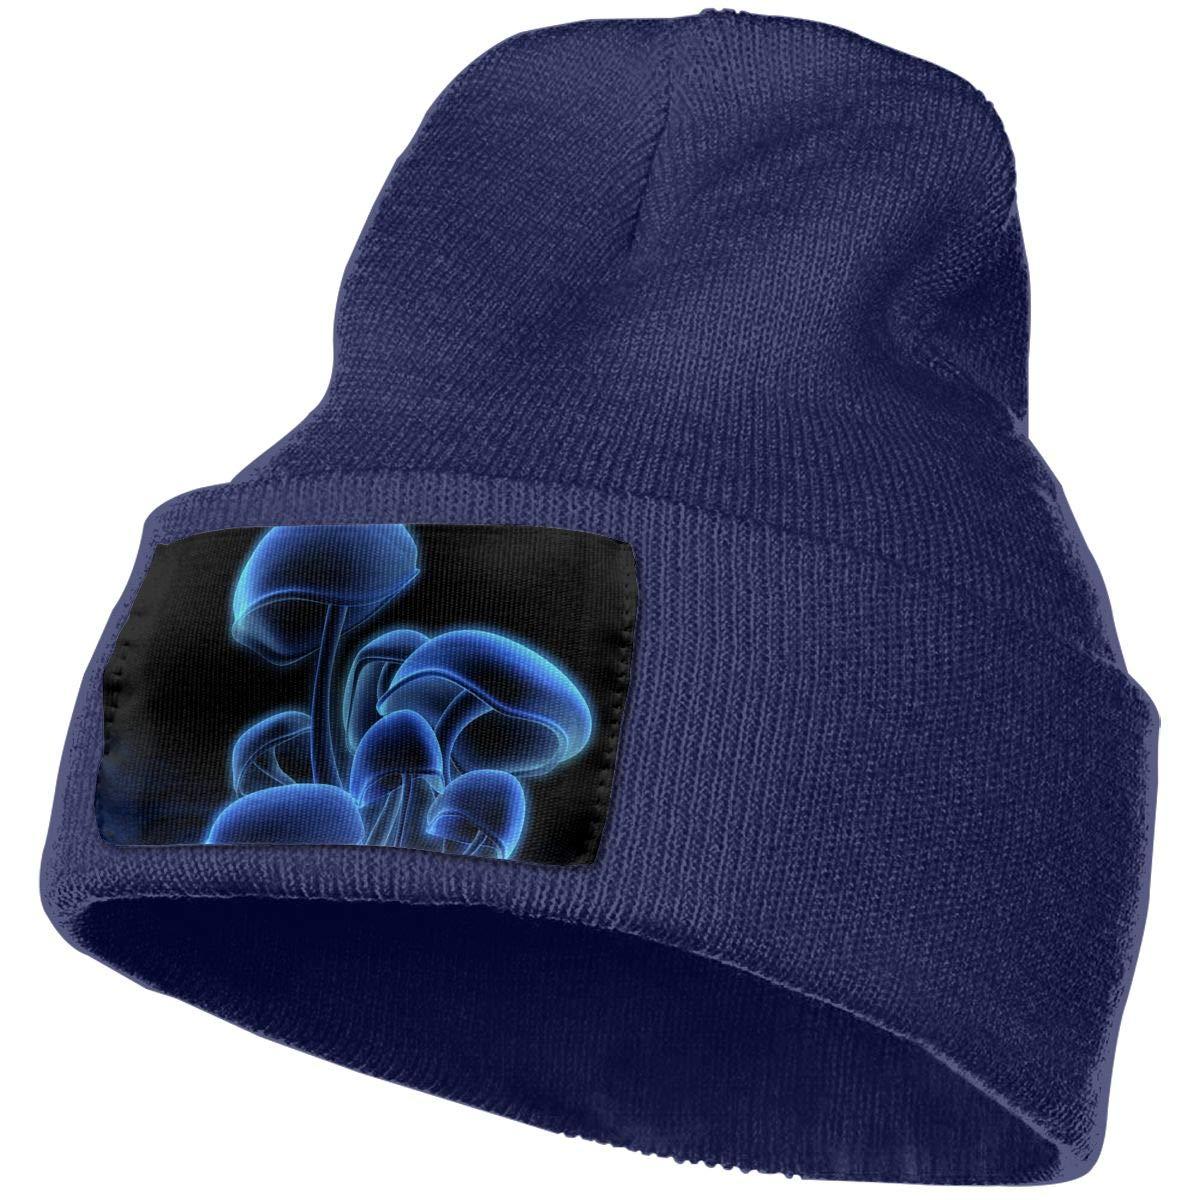 Helidoud Cool Magic Mushrooms Winter Beanie Hat Knit Skull Cap for for Men /& Women